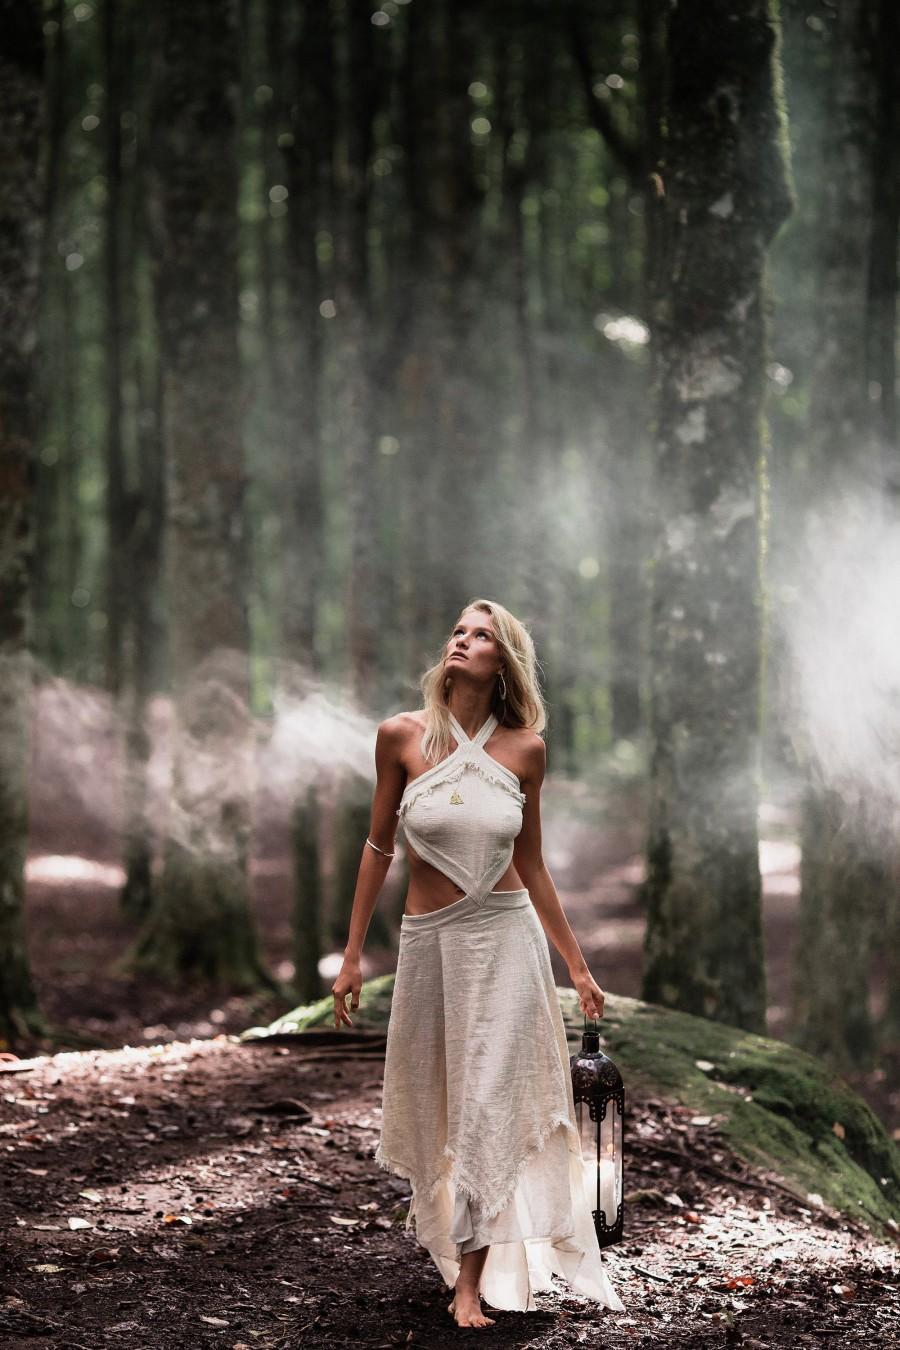 Wedding - NEW! Bohemian Boho Wedding Dress • Organic Boho Dress White • Goddess Maxi Long Dress • Hippie Simple Wedding Dress •Gypsy Bridesmaid Dress